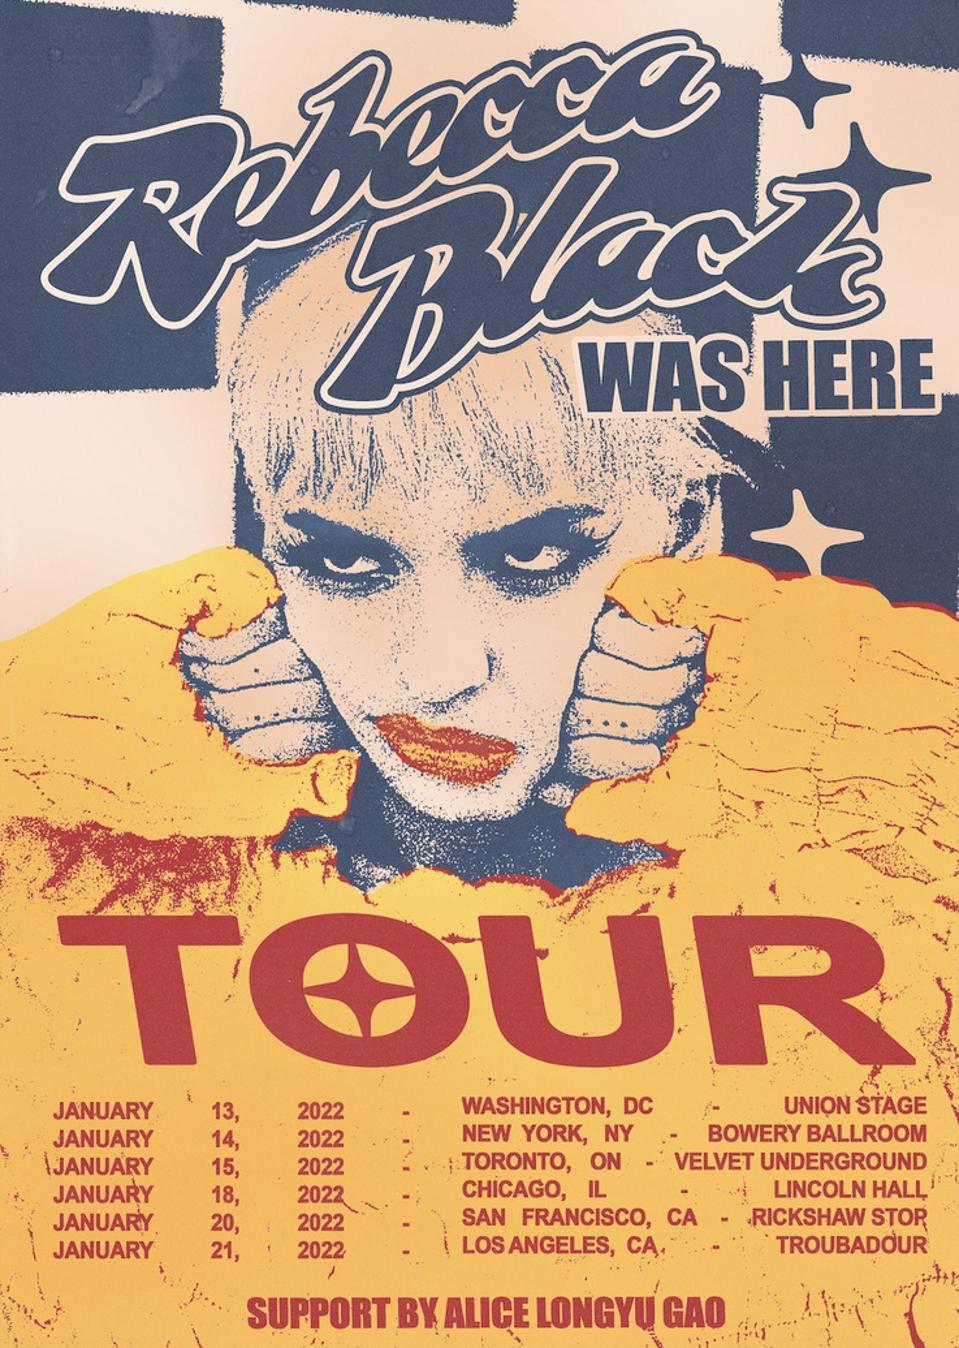 The poster for Rebecca Black's ″Rebecca Black Was Here″ tour in 2022.